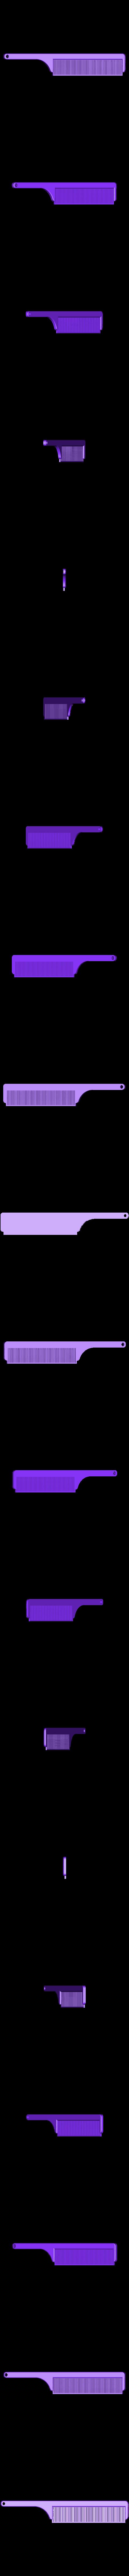 Brush.stl Download free STL file a brush • 3D printing object, EIKICHI